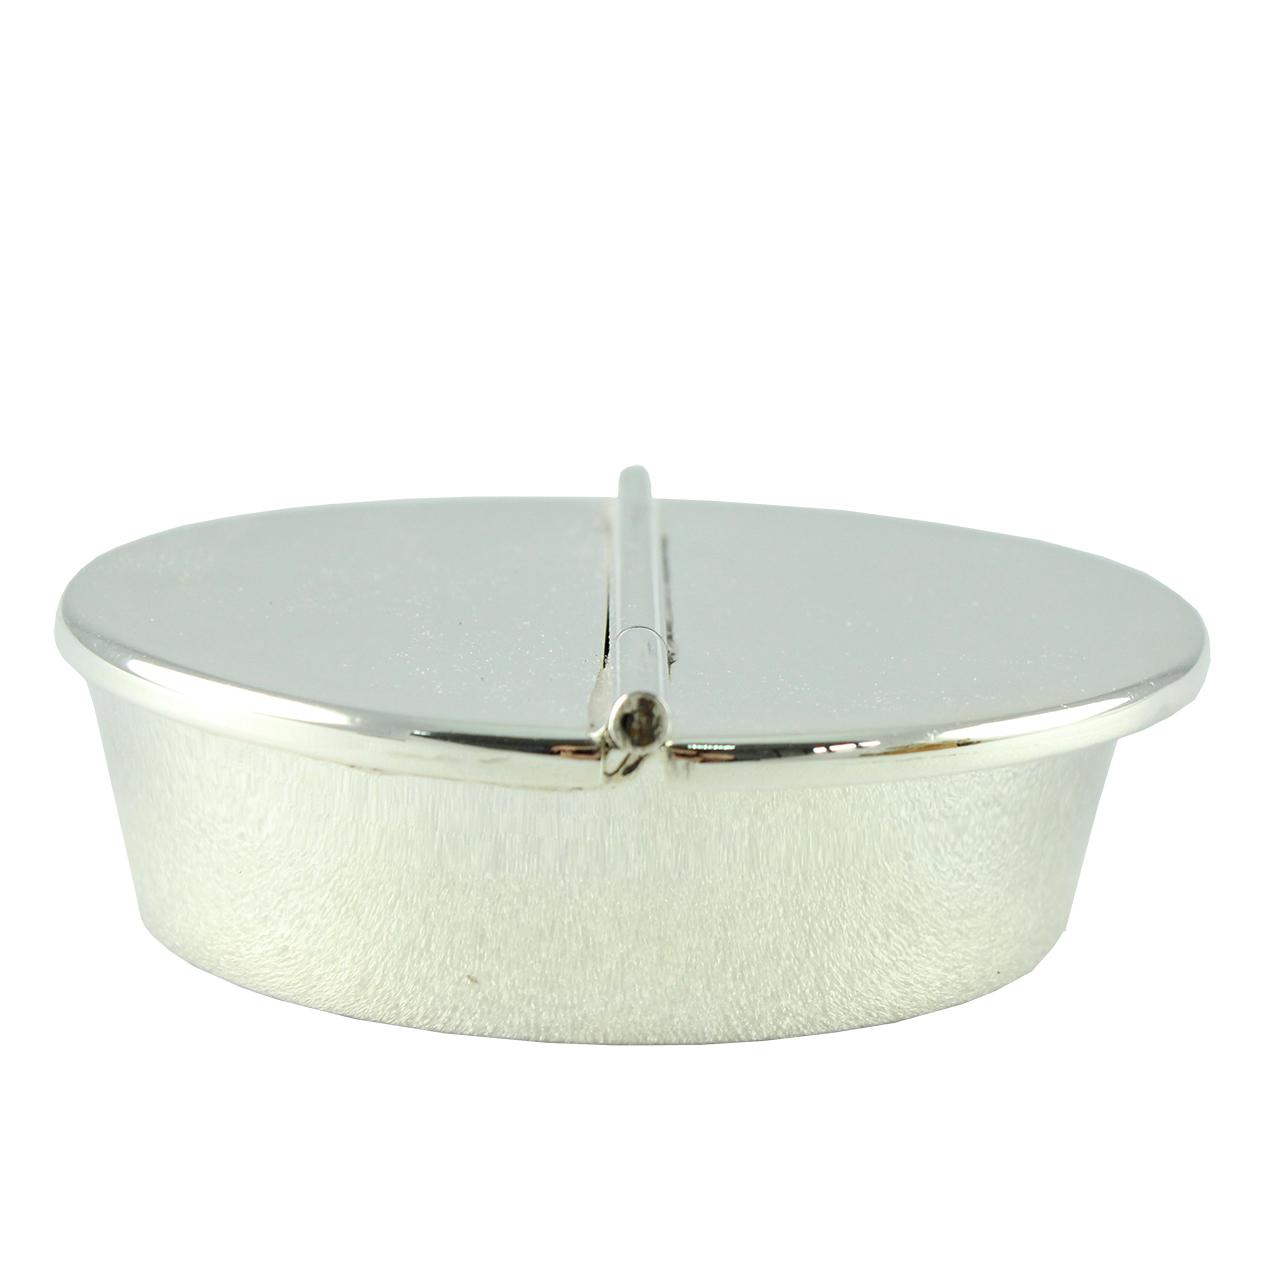 Scrumiera Rotunda Din Inox 10 Cm